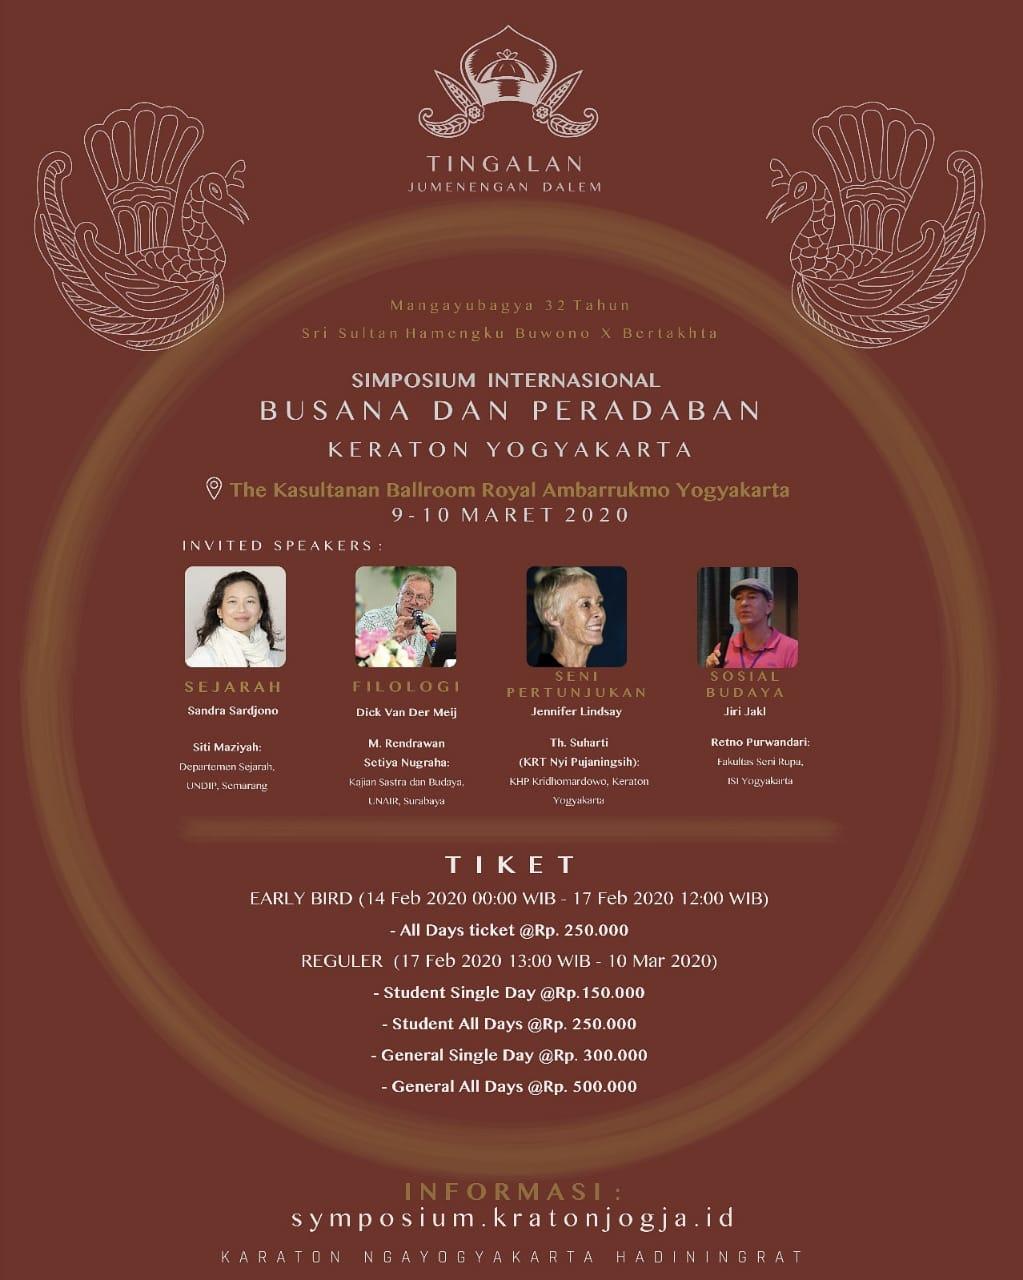 Simposium Internasional Busana dan Peradaban Kraton Jogja 2020